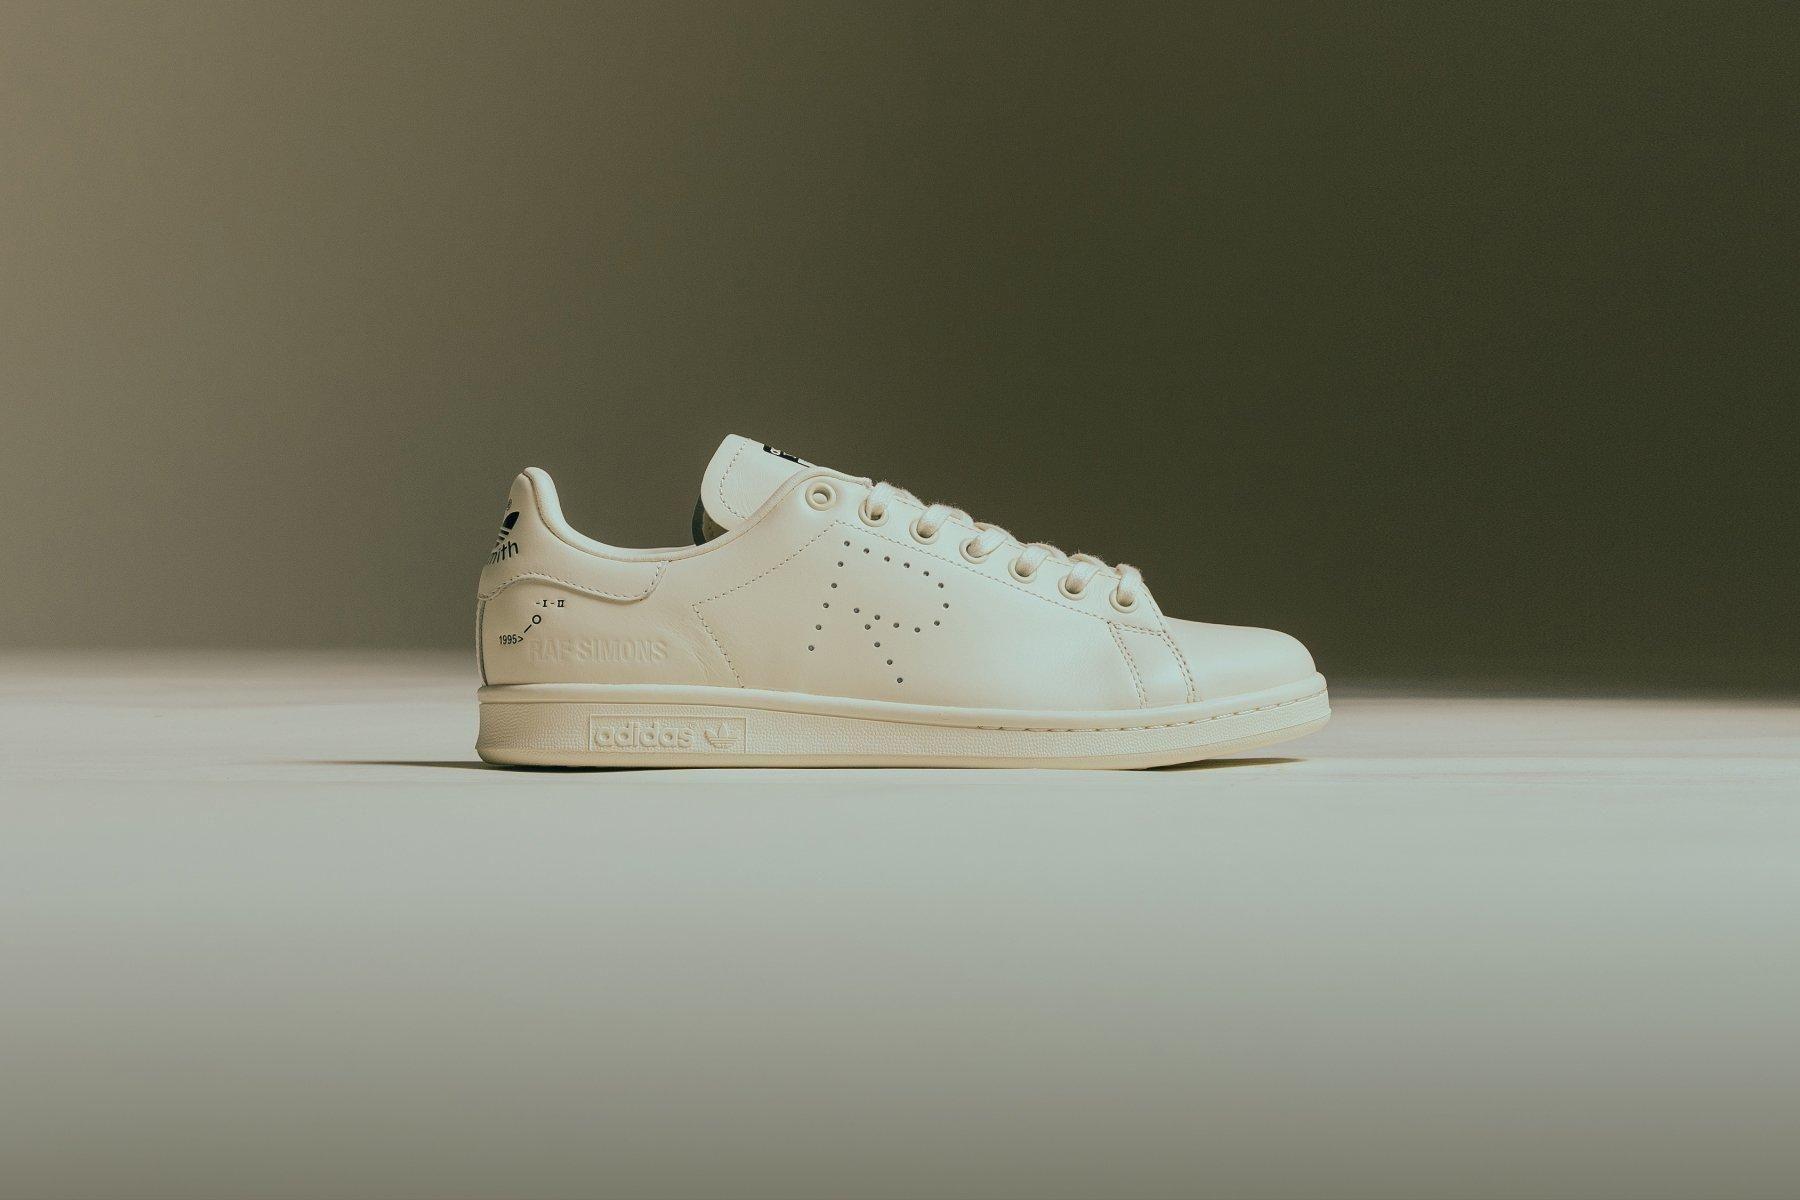 Adidas X Raf Simons Stan Smith  Core White Core Brown  F34256  Bold Yellow Flat White  F34259  Core White Core Black  F34264  Feature  September 18 2018 34